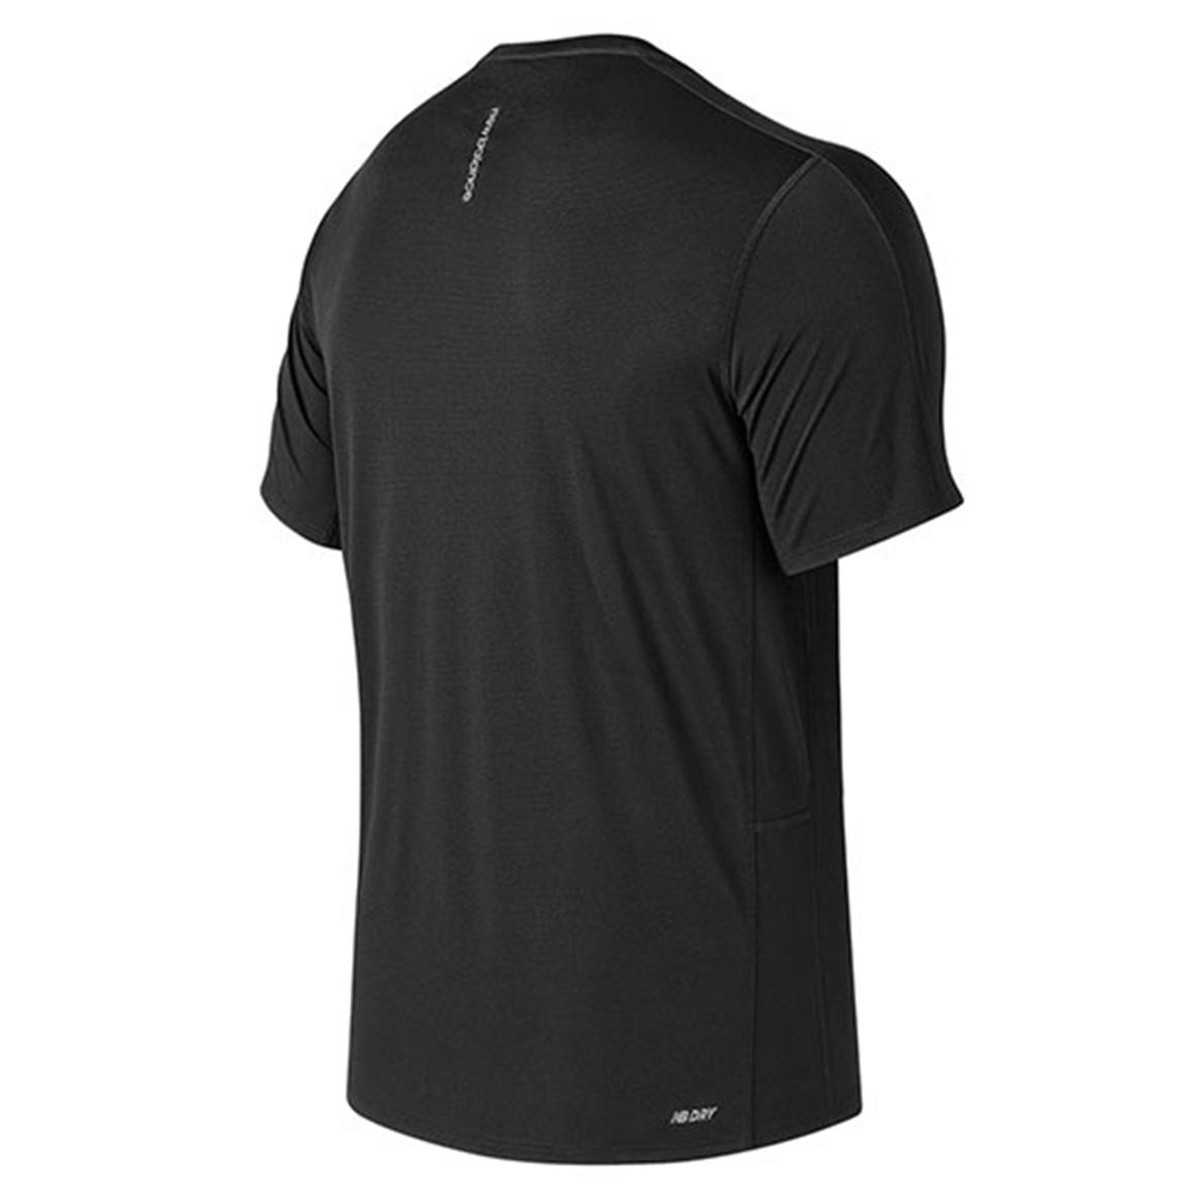 Camiseta New Balance Accelerate - Preta - Masculino